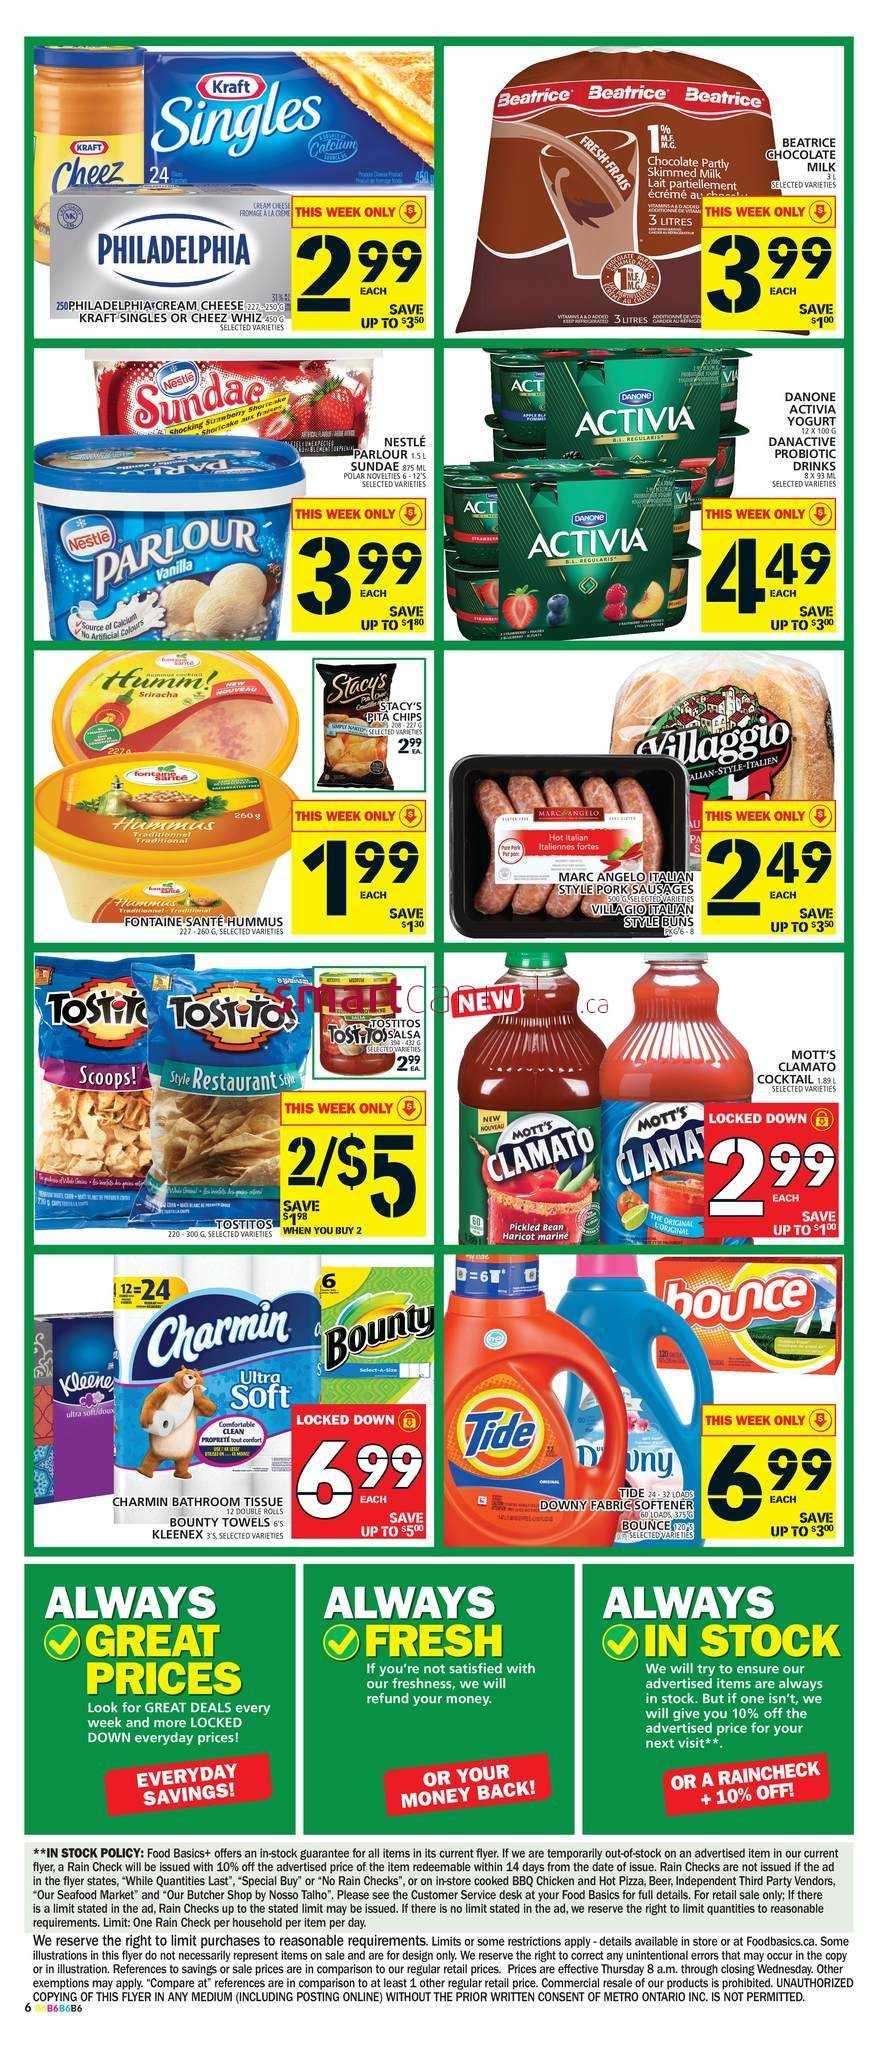 Food Basics Flyer Feb